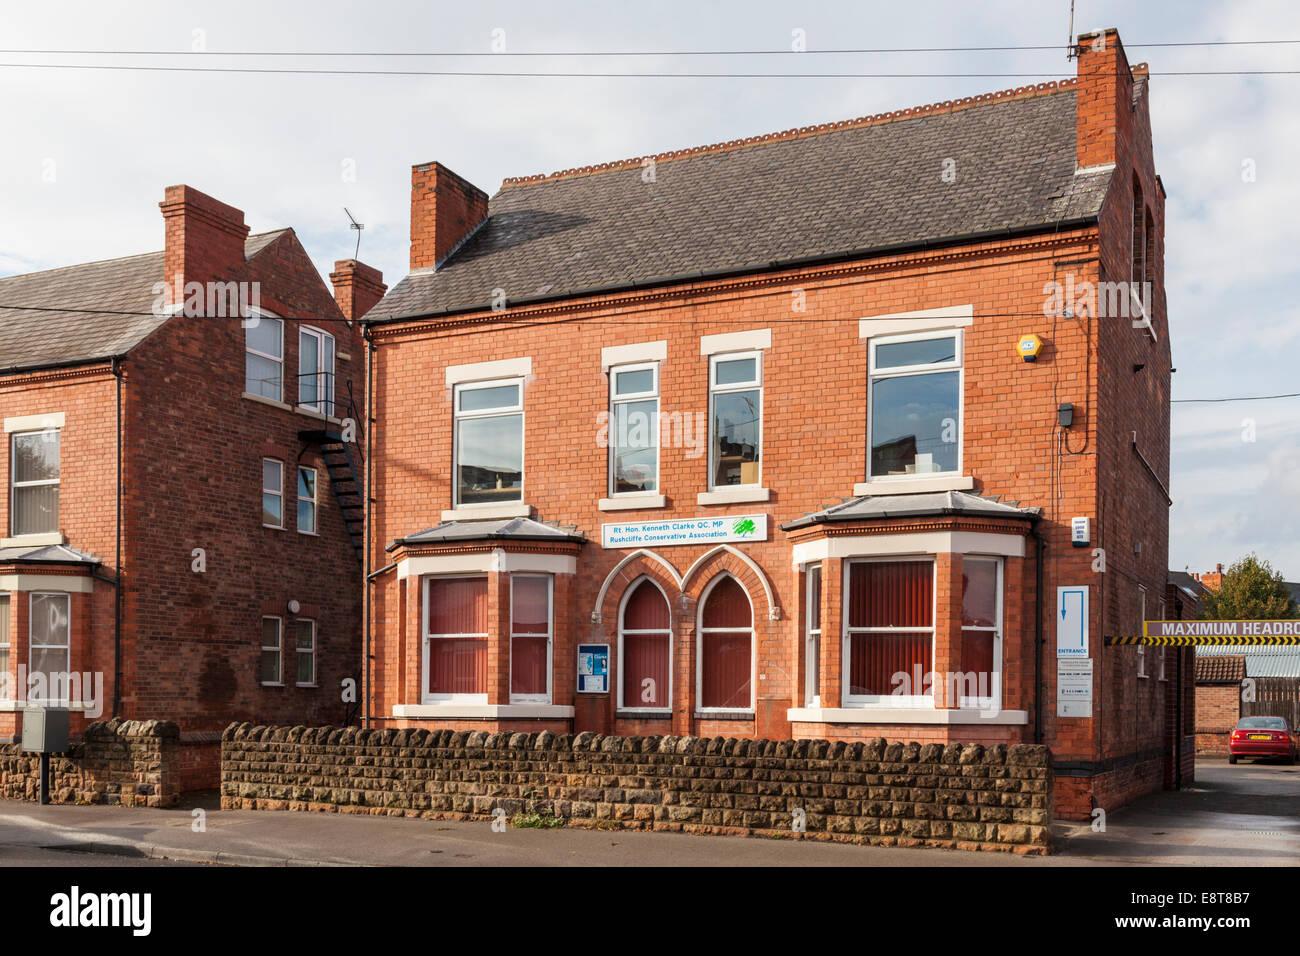 Rushcliffe Conservative Association Headquarters in West Bridgford, Nottinghamshire, England, UK - Stock Image